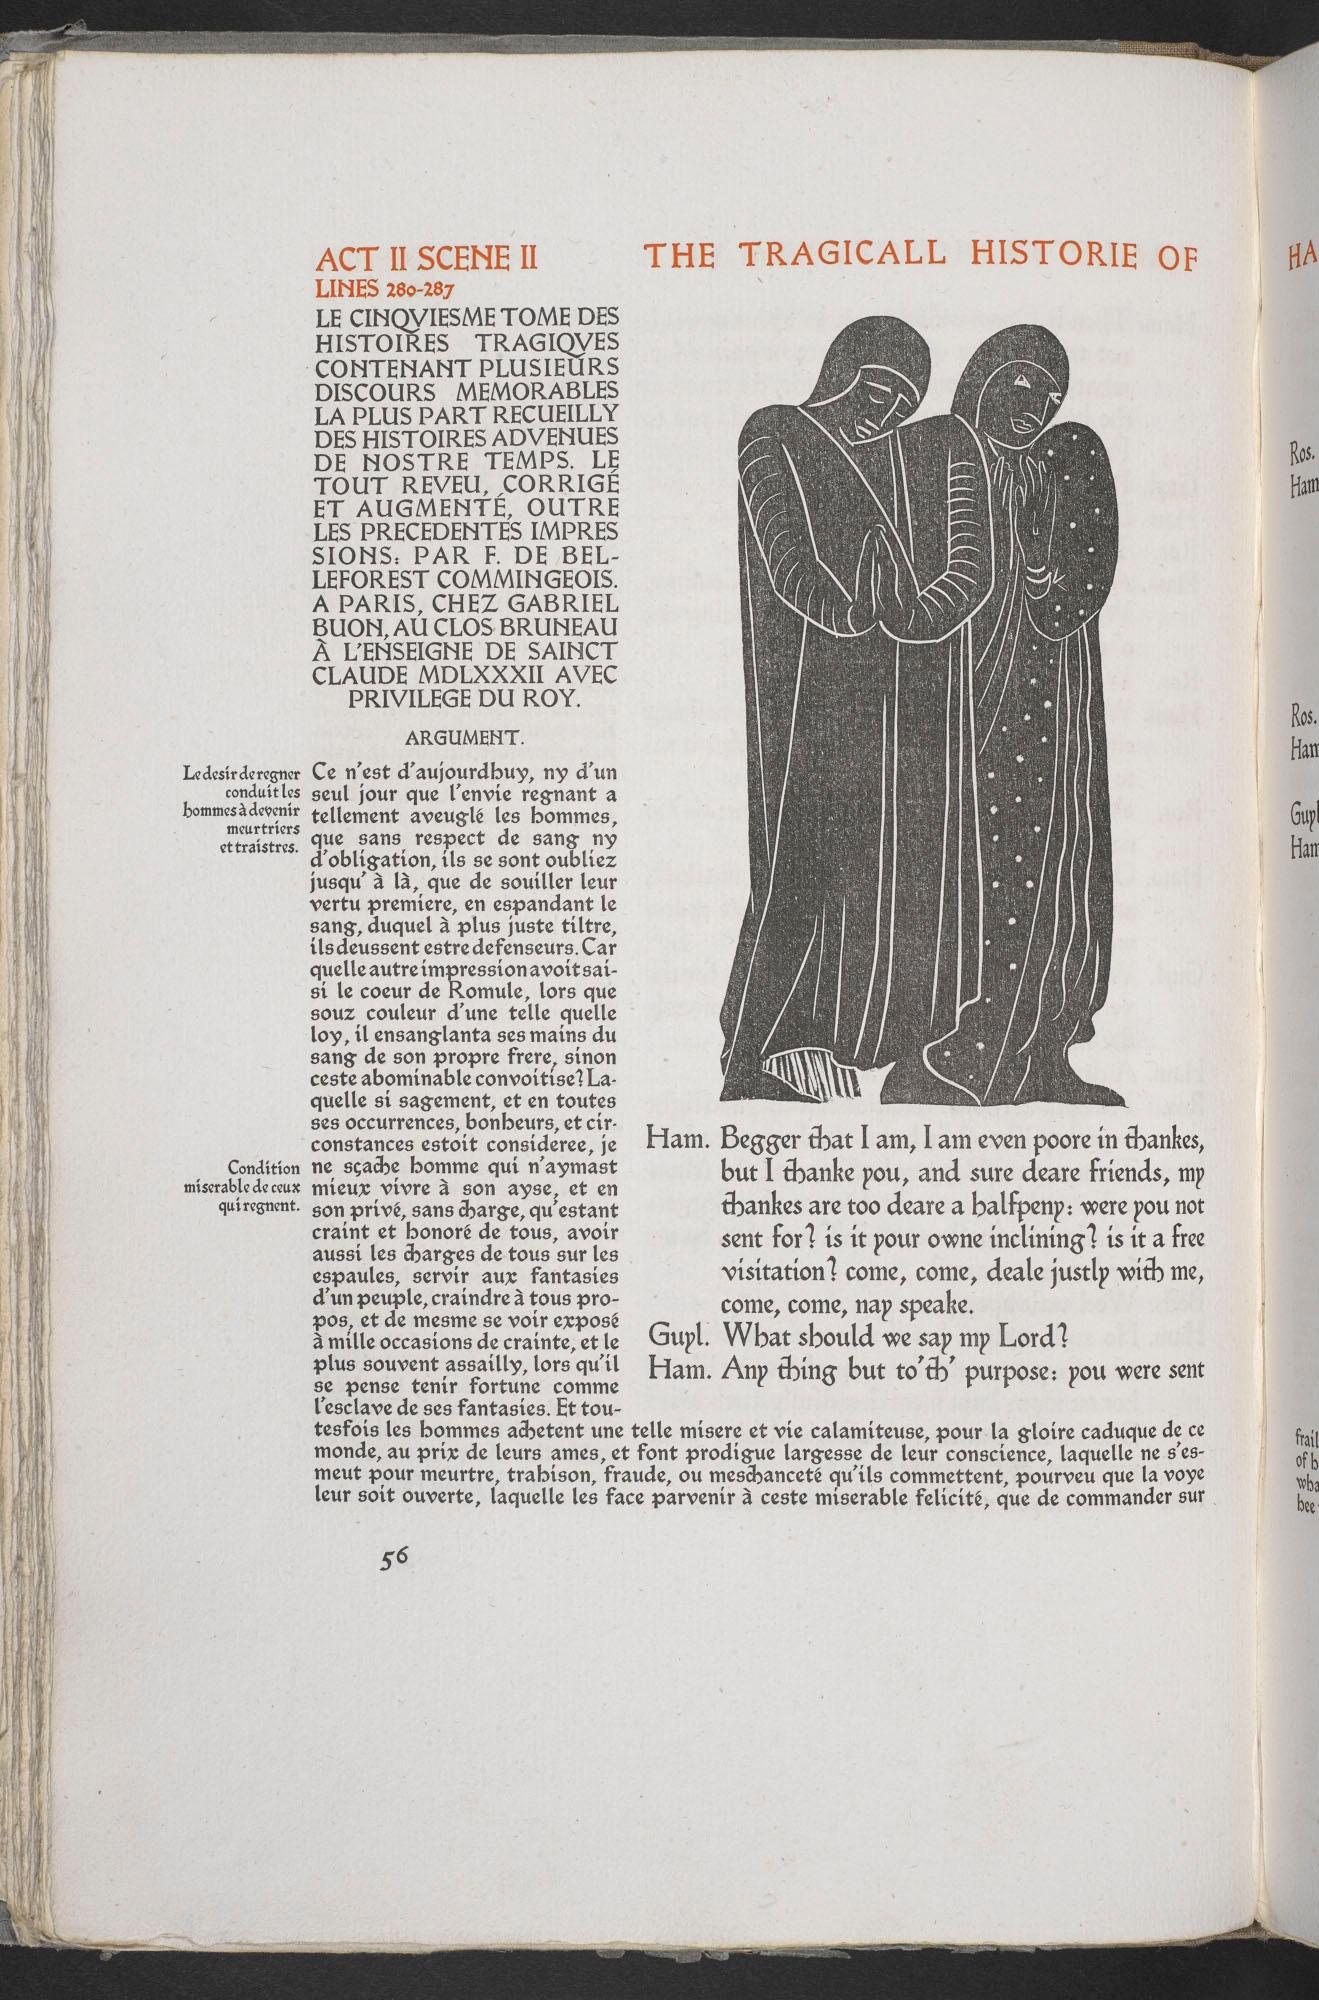 Hamlet and revenge - The British Library